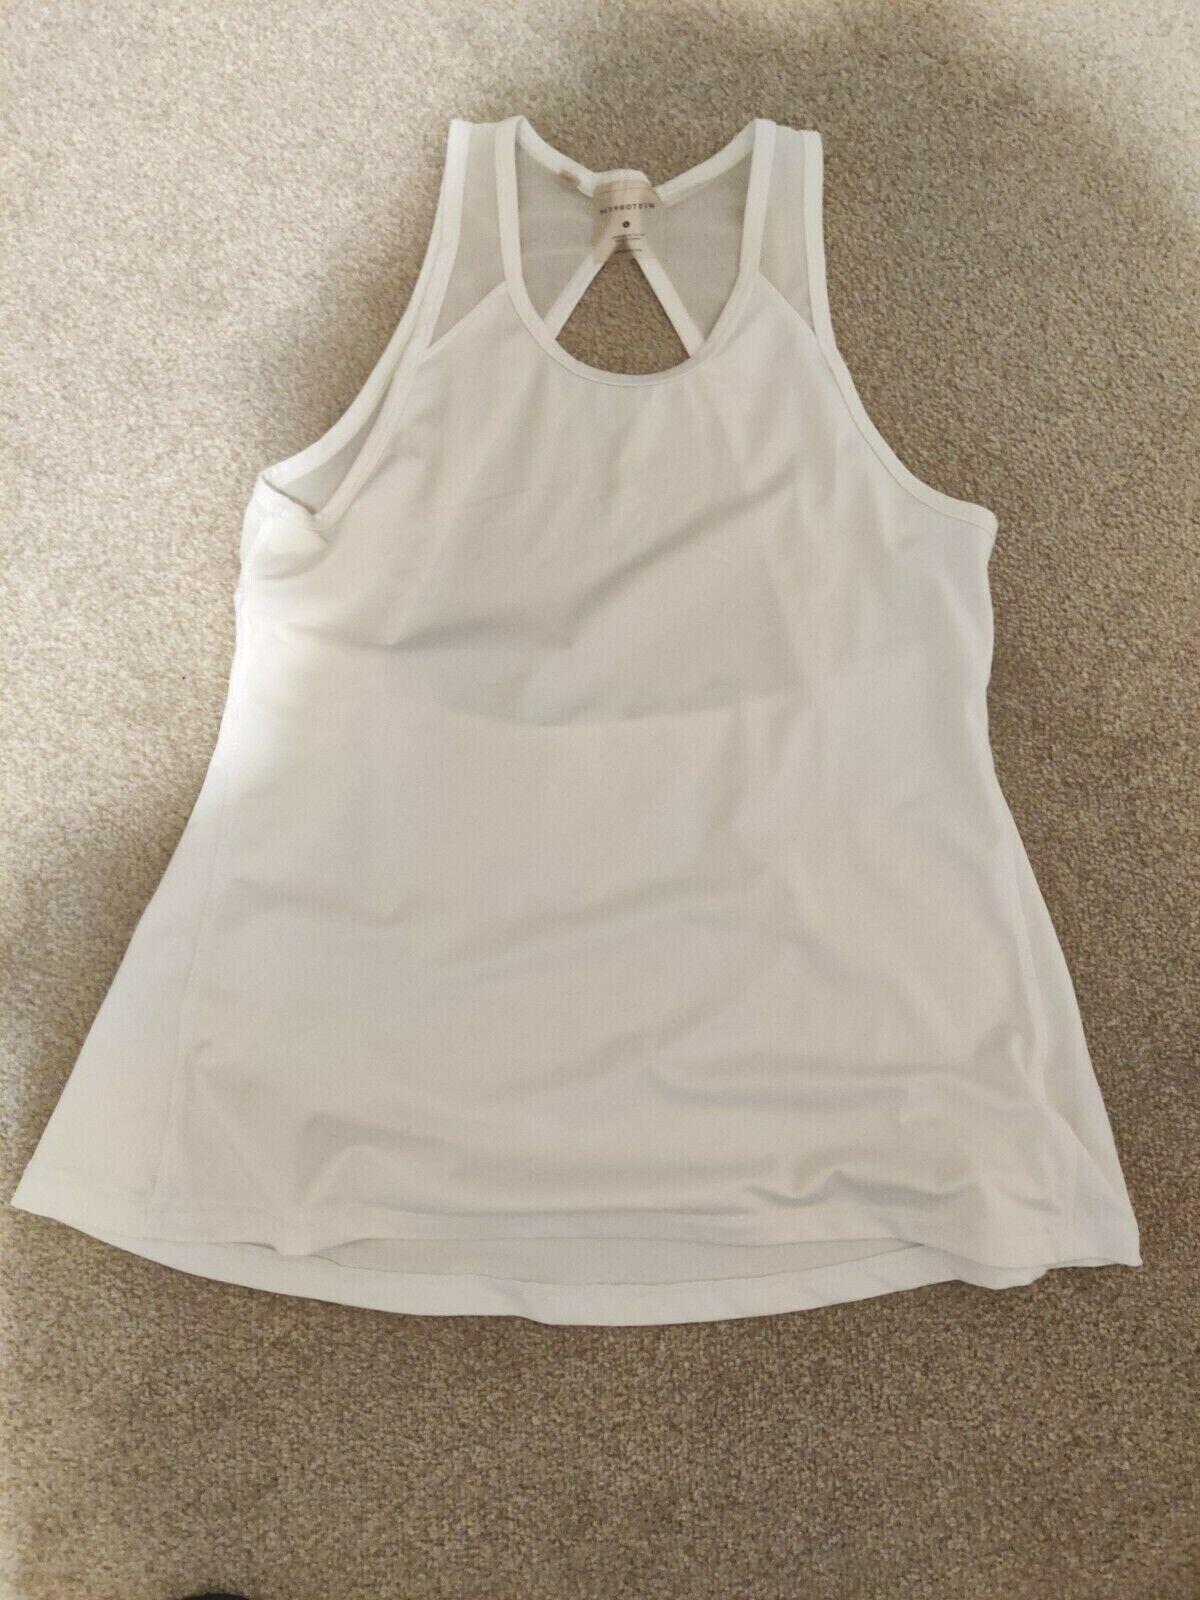 Myprotein white open back mesh sport gym tank top size S